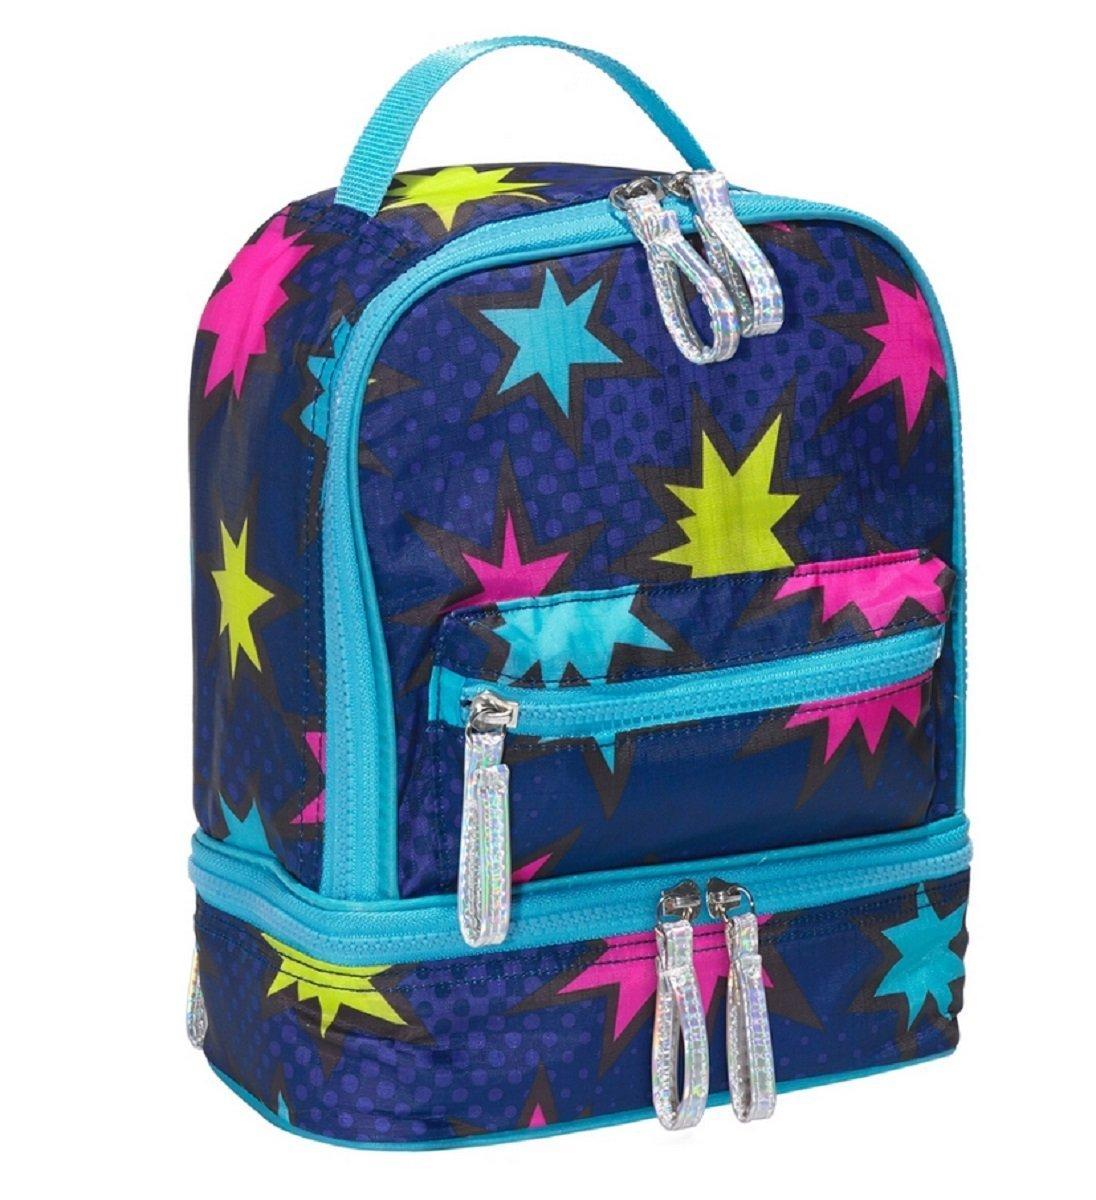 Three Cheers For Girls Blue Pop Art Lunchbox Cooler